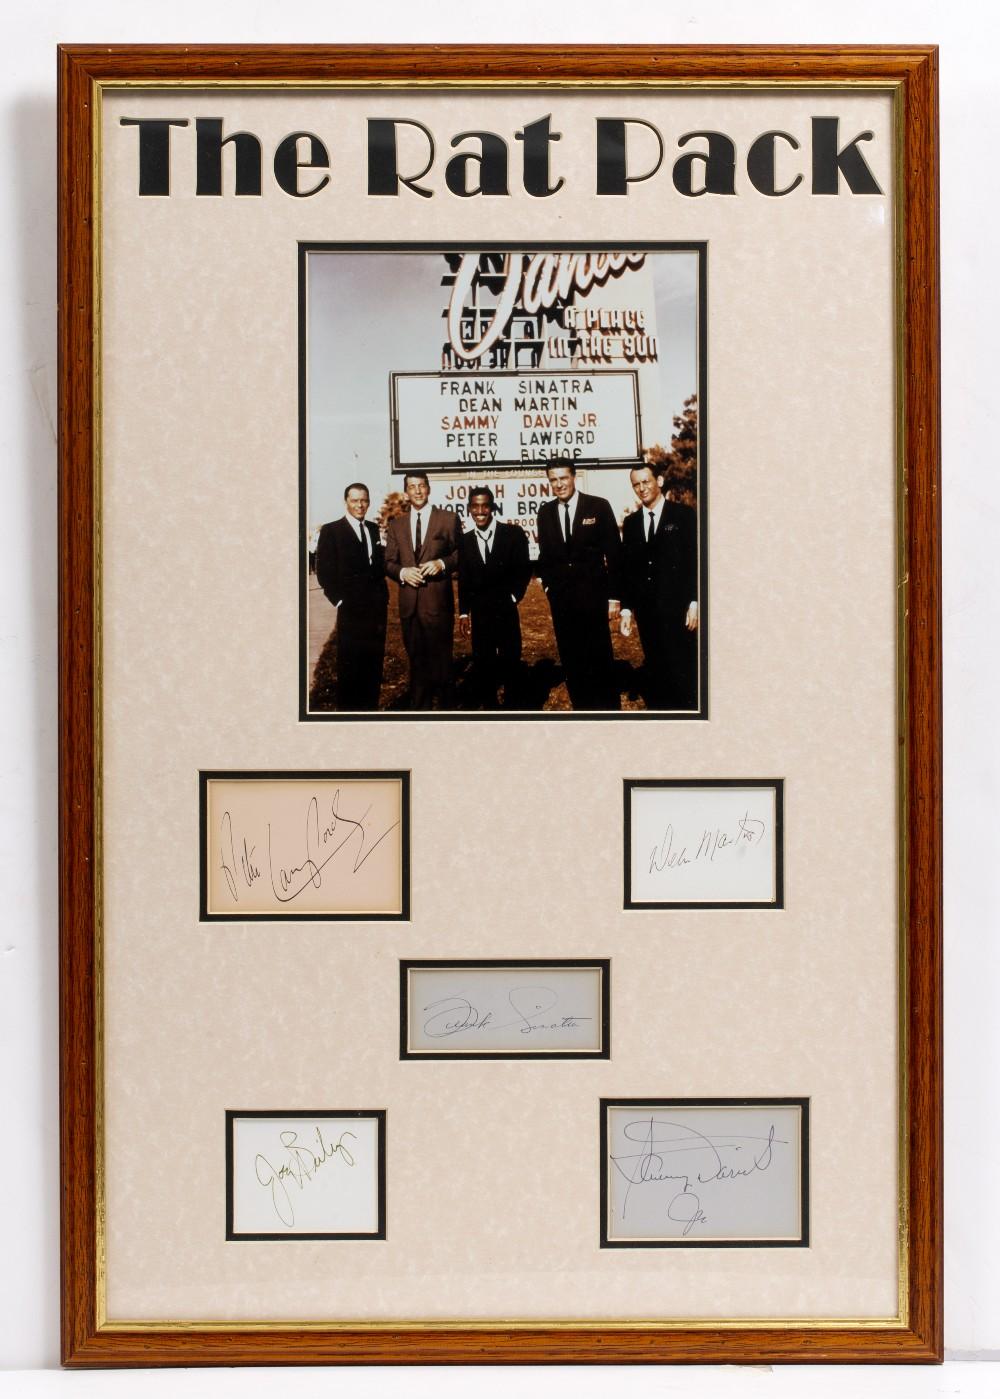 Lot 20 - 'THE RAT PACK' SIGNATURES Frank Sinatra, Dean Martin, Sammy Davis Jr, Peter Lawford and Joey Bishop,